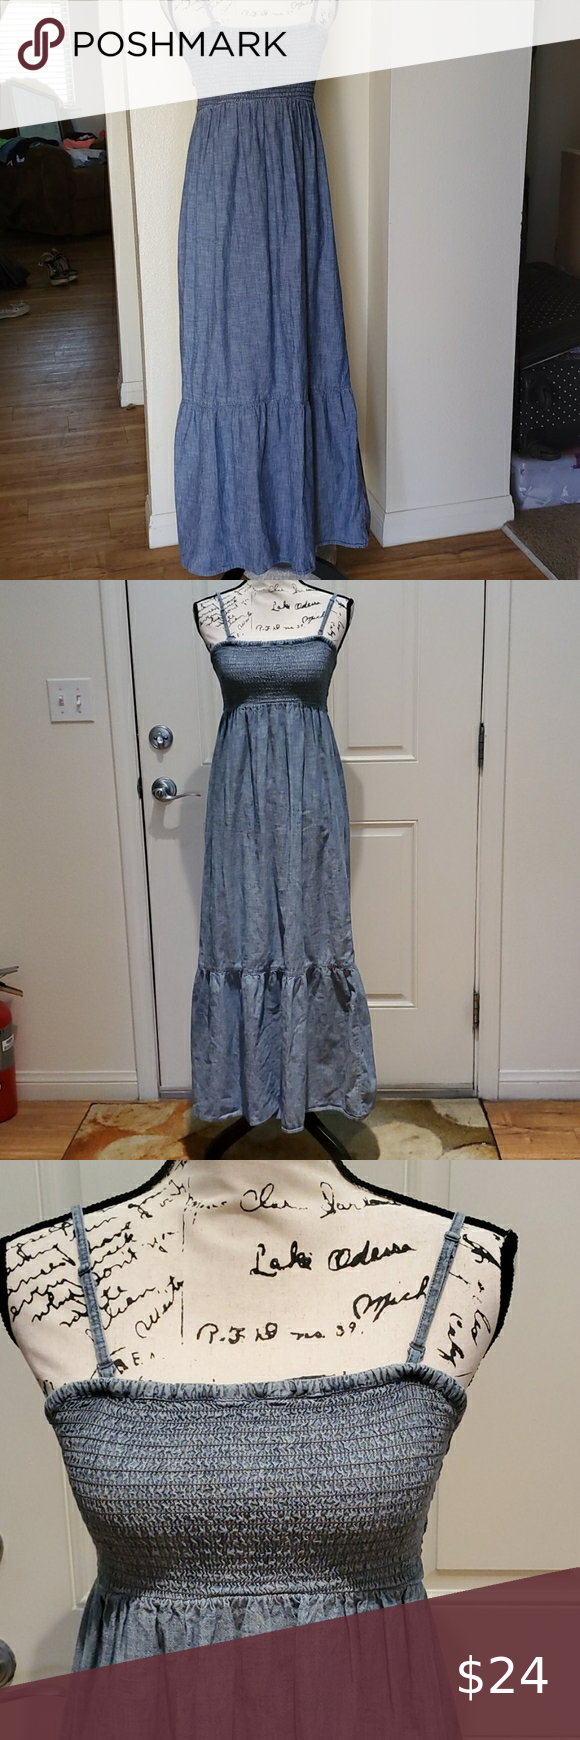 Gap Maxi Dress Brand Gap Style Ankle Length Jean Dress Detachable Straps Color Blue Jean Size S No Rips In 2020 Gap Maxi Dress Clothes Design Boho Maxi Dress [ 1740 x 580 Pixel ]